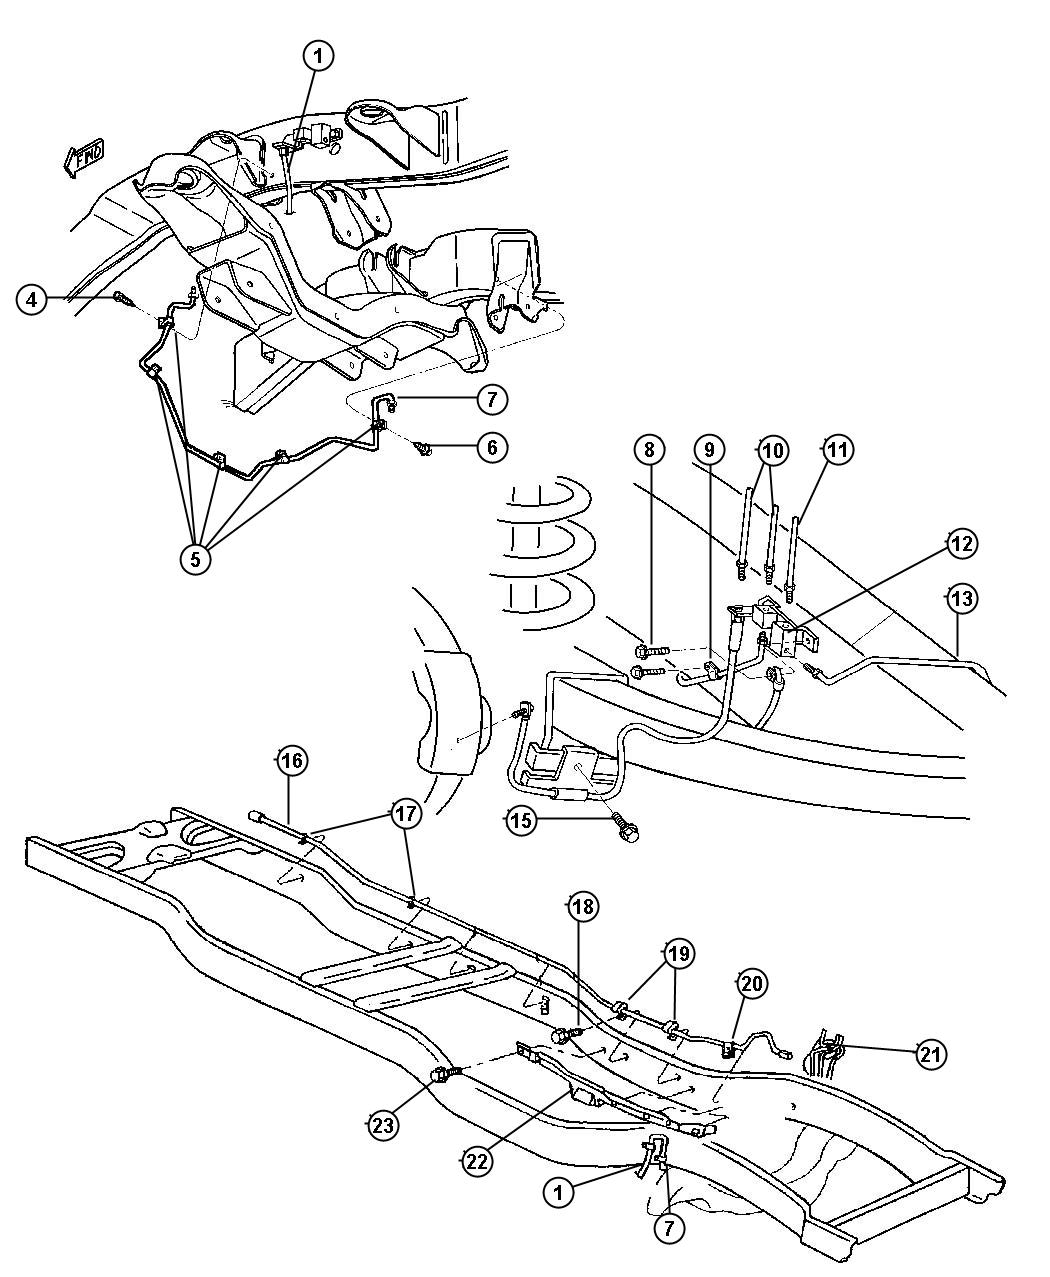 hight resolution of 2002 dodge ram 1500 5 9 firing order on 97 dodge 1500 wiring diagram